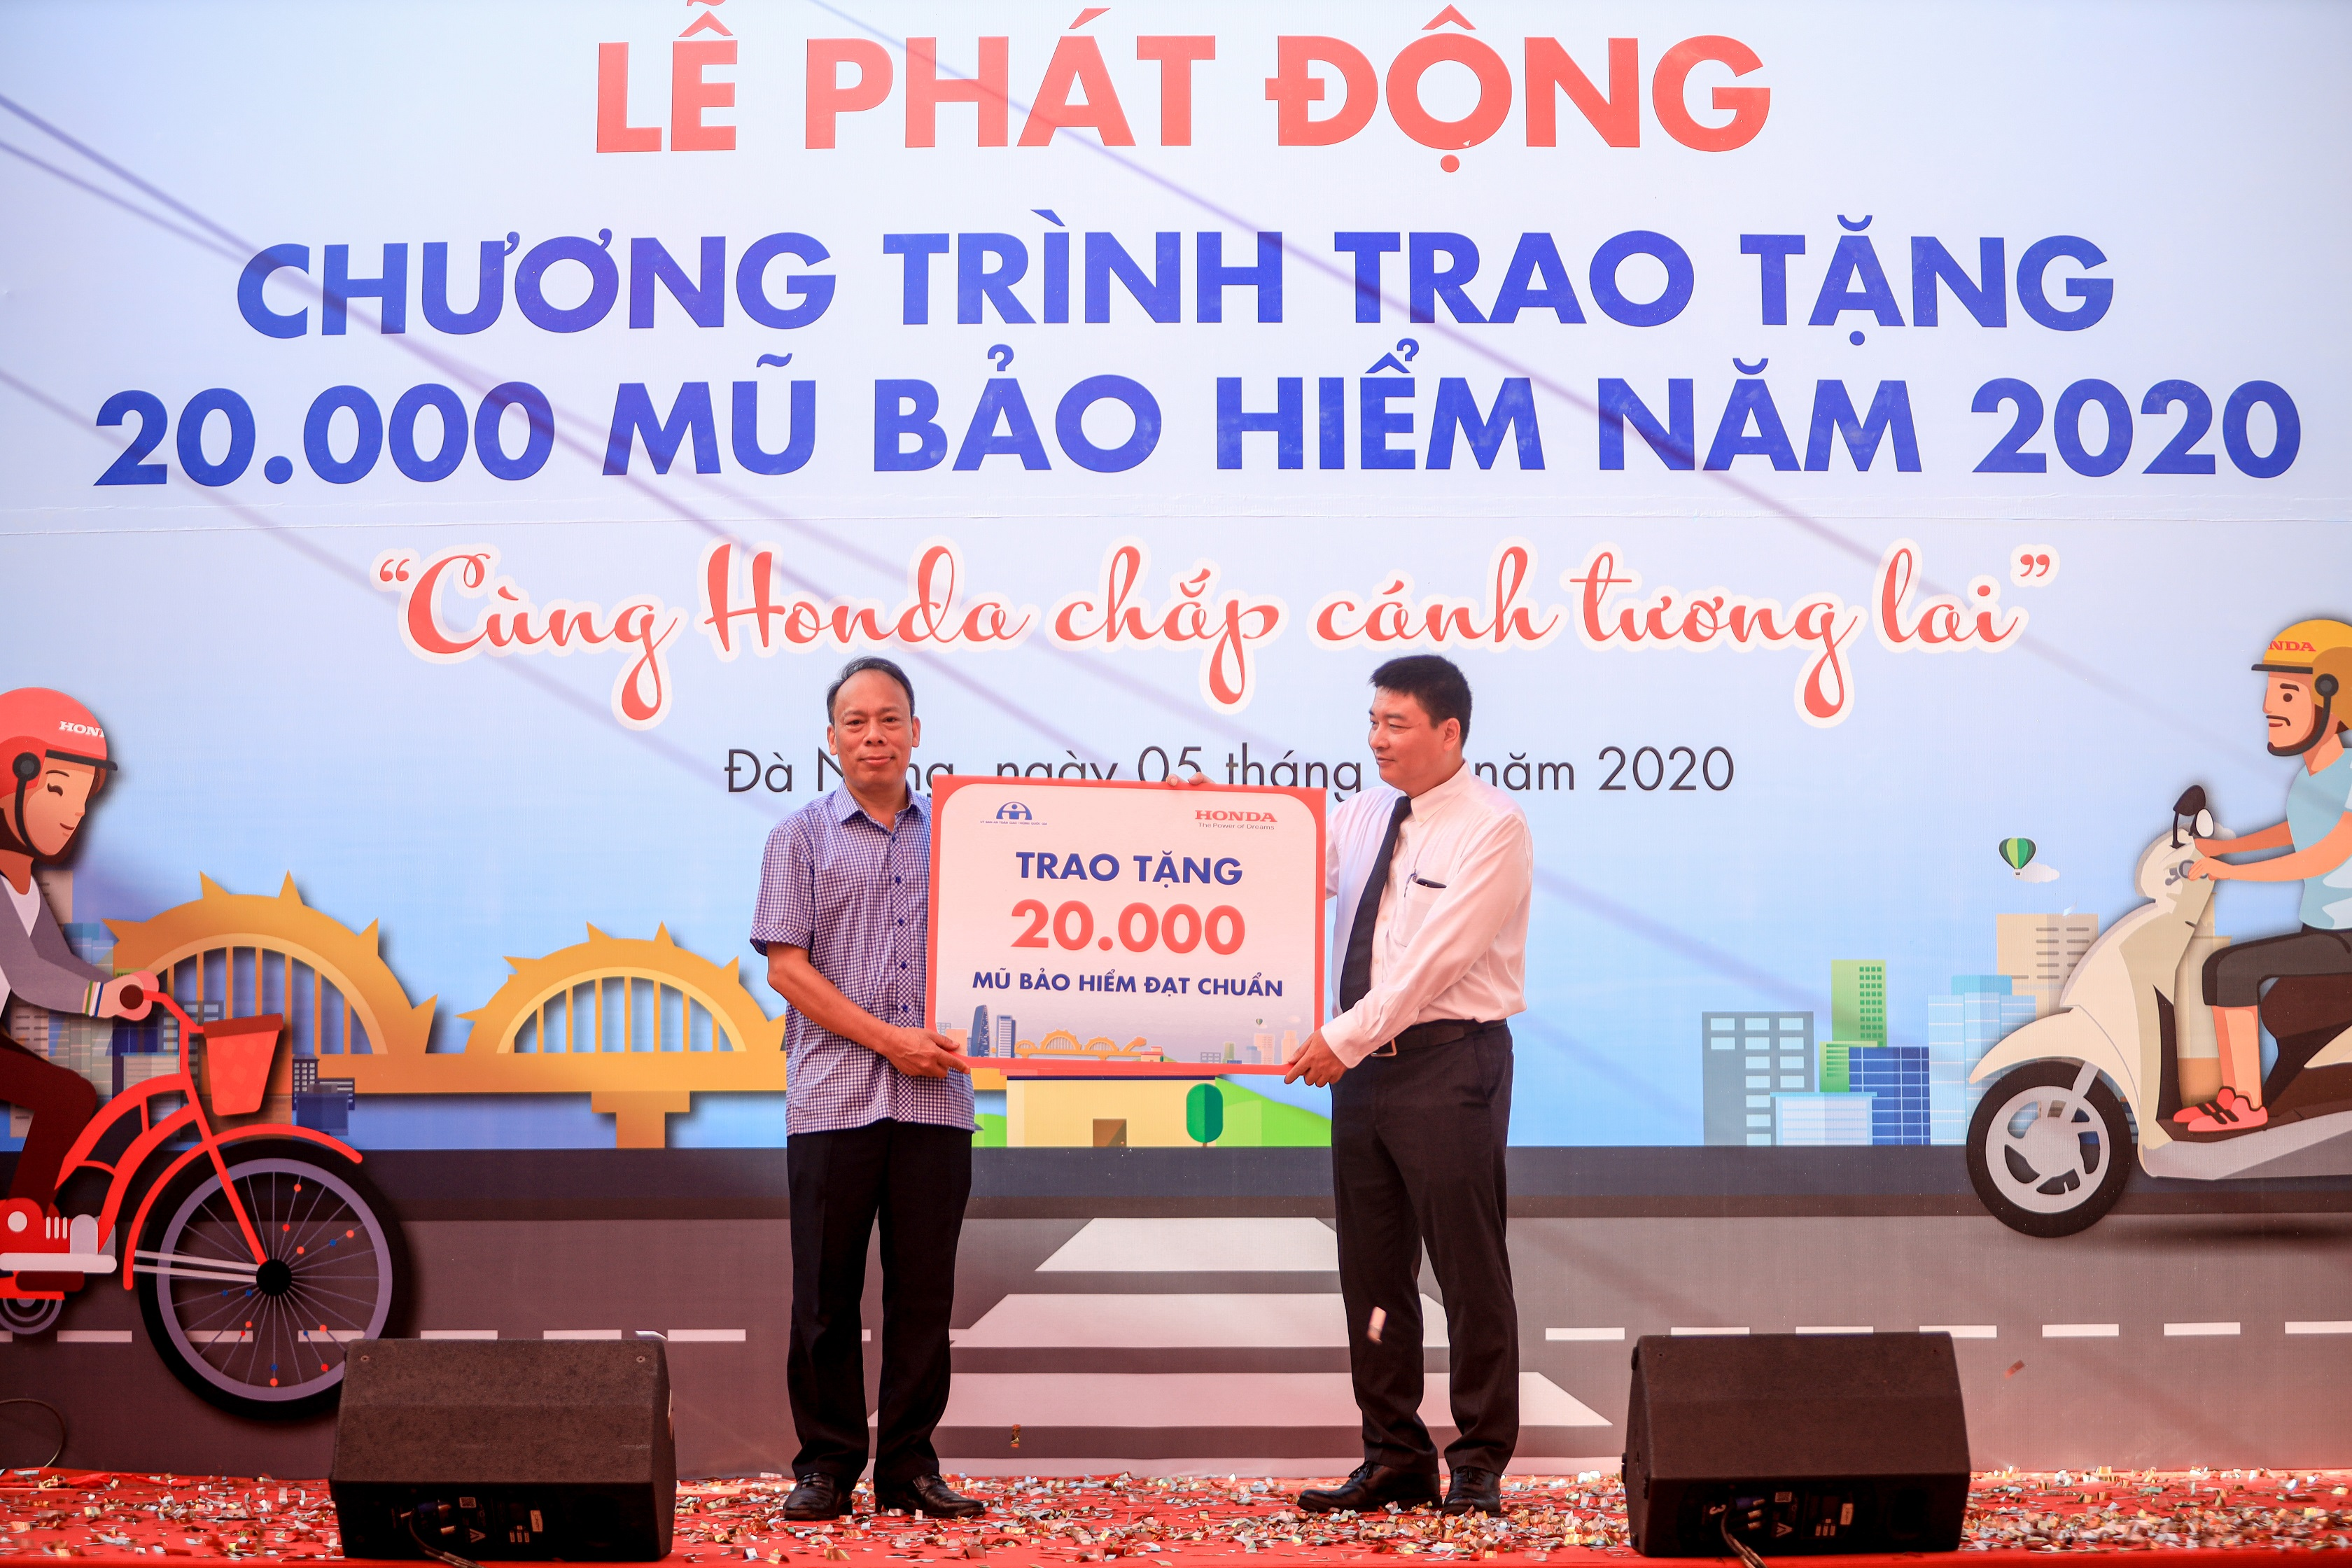 2-honda-vn-phoi-hop-voi-uy-ban-atgt-quoc-gia-trao-tang-20000-mu-bao-hiem-trong-nam-2020.jpg